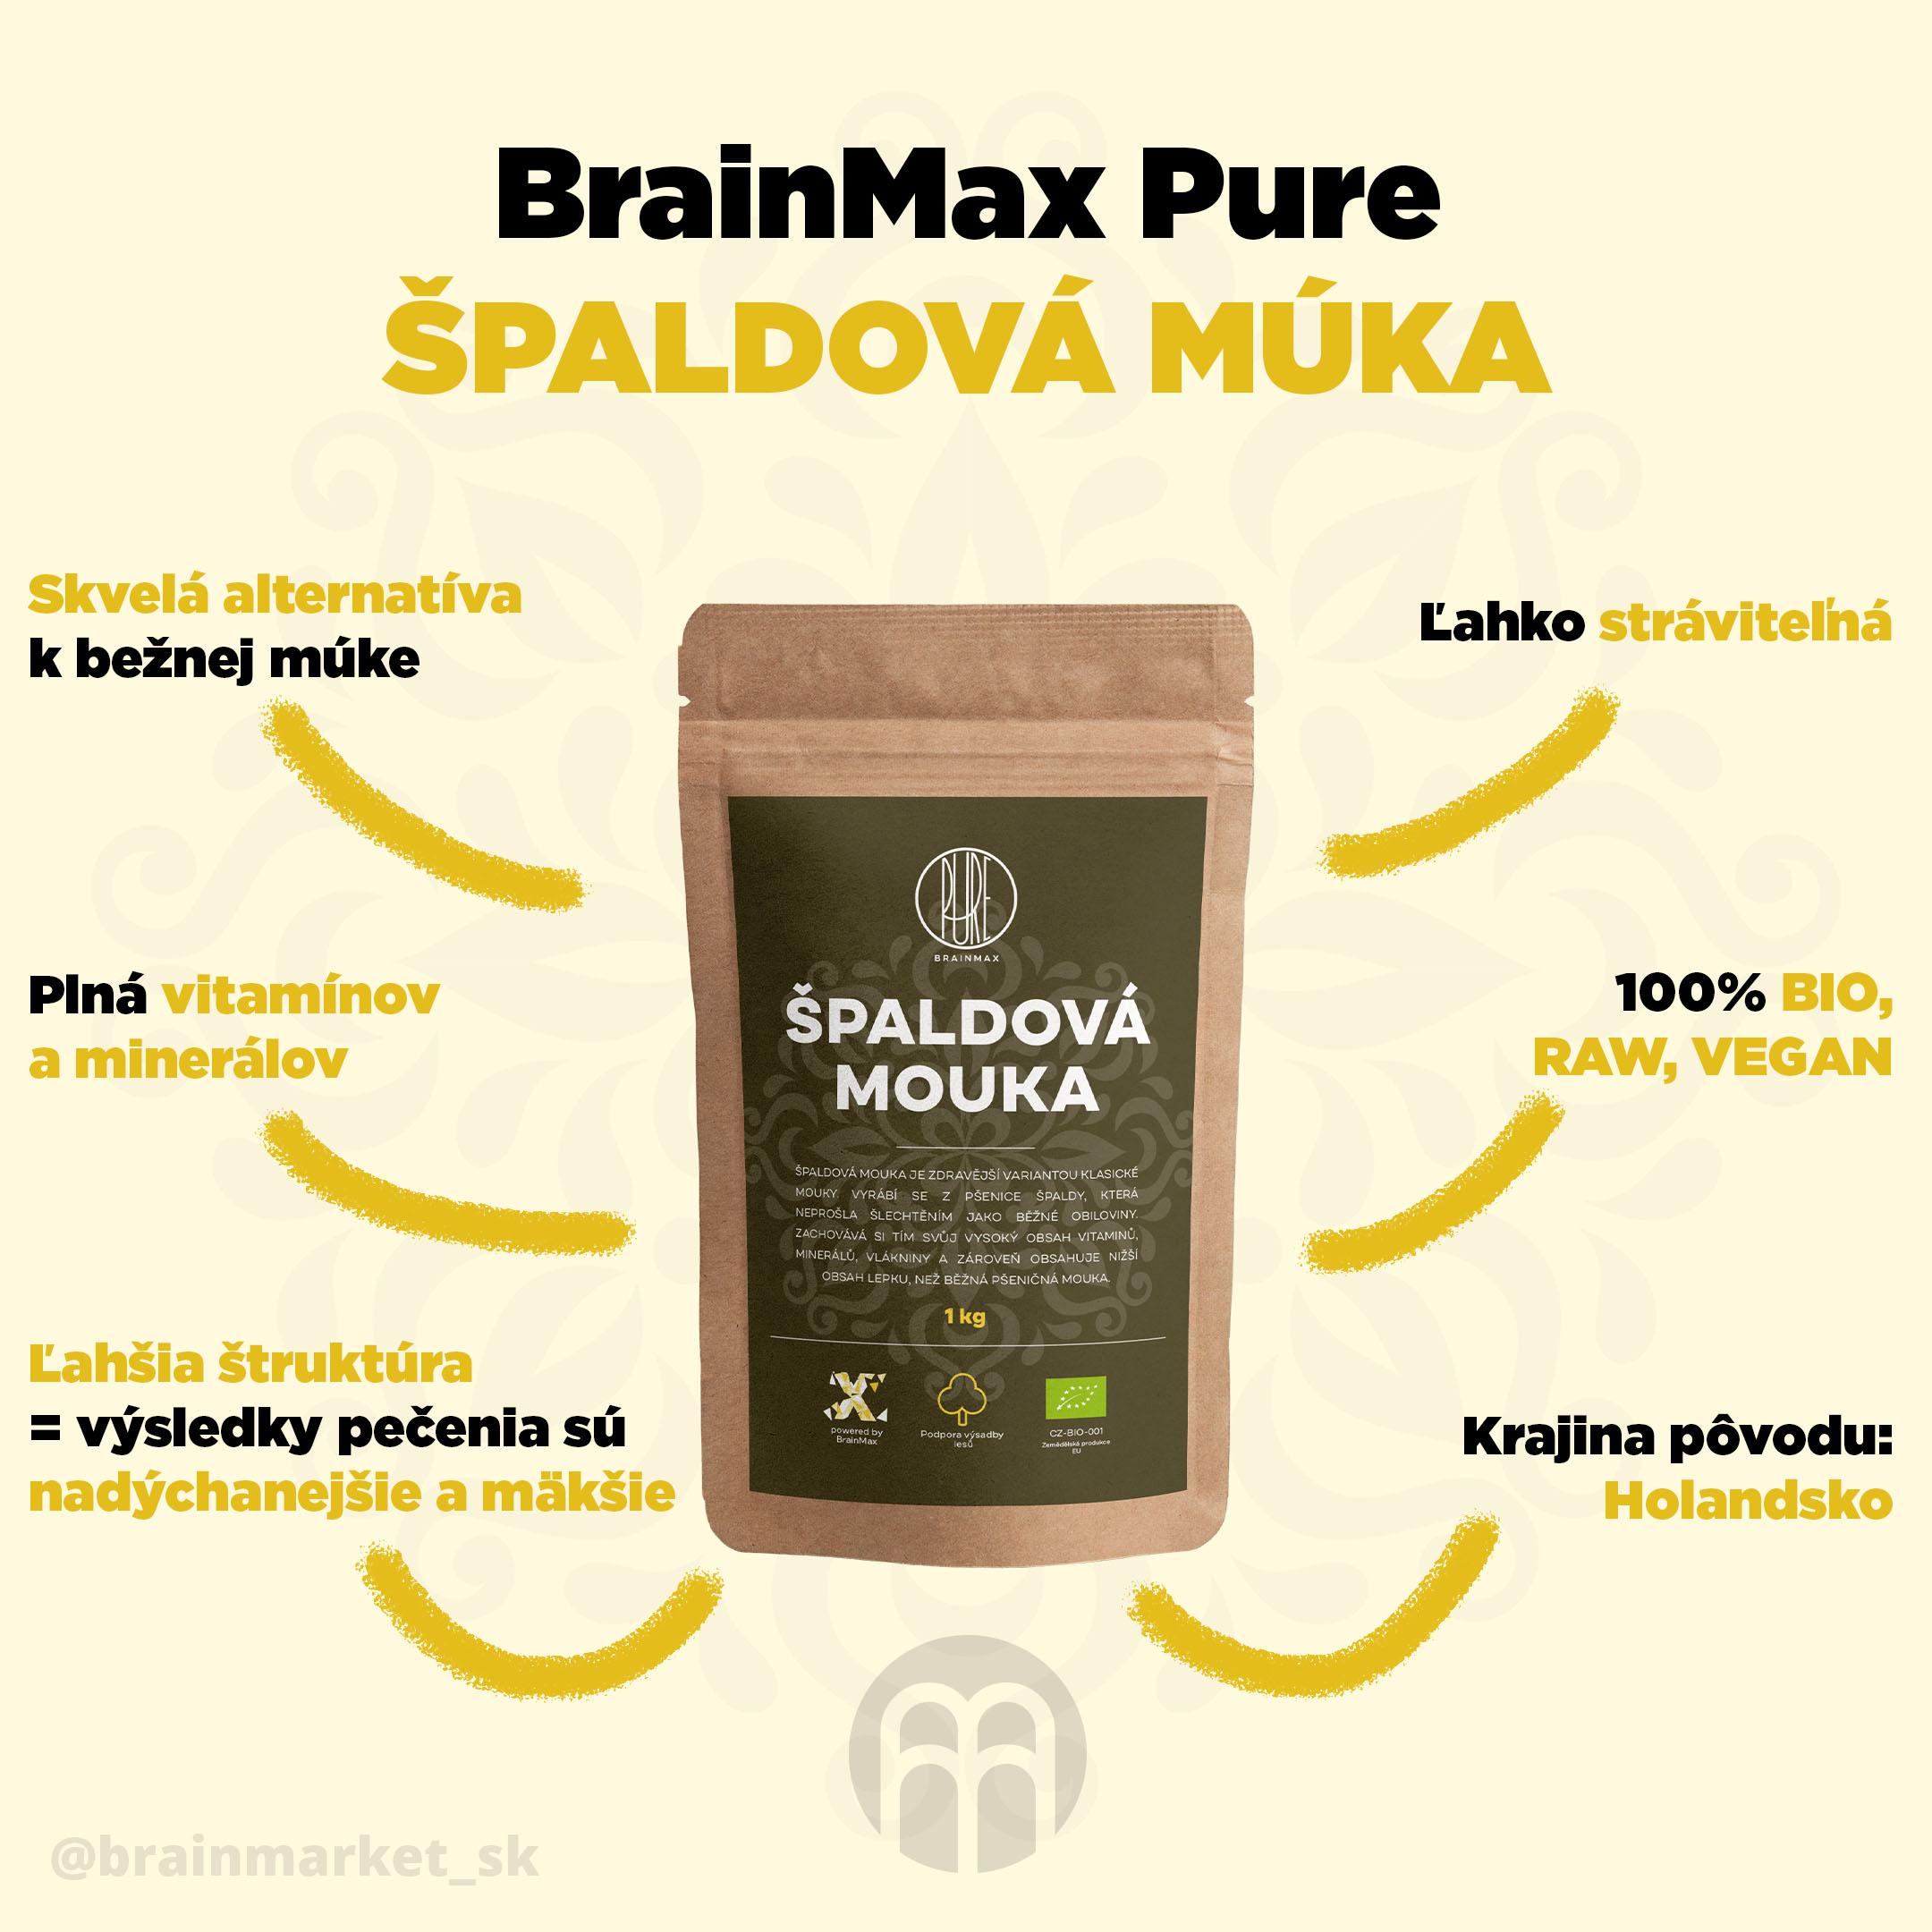 spaldova-mouka-infografika-brainmarket-cz